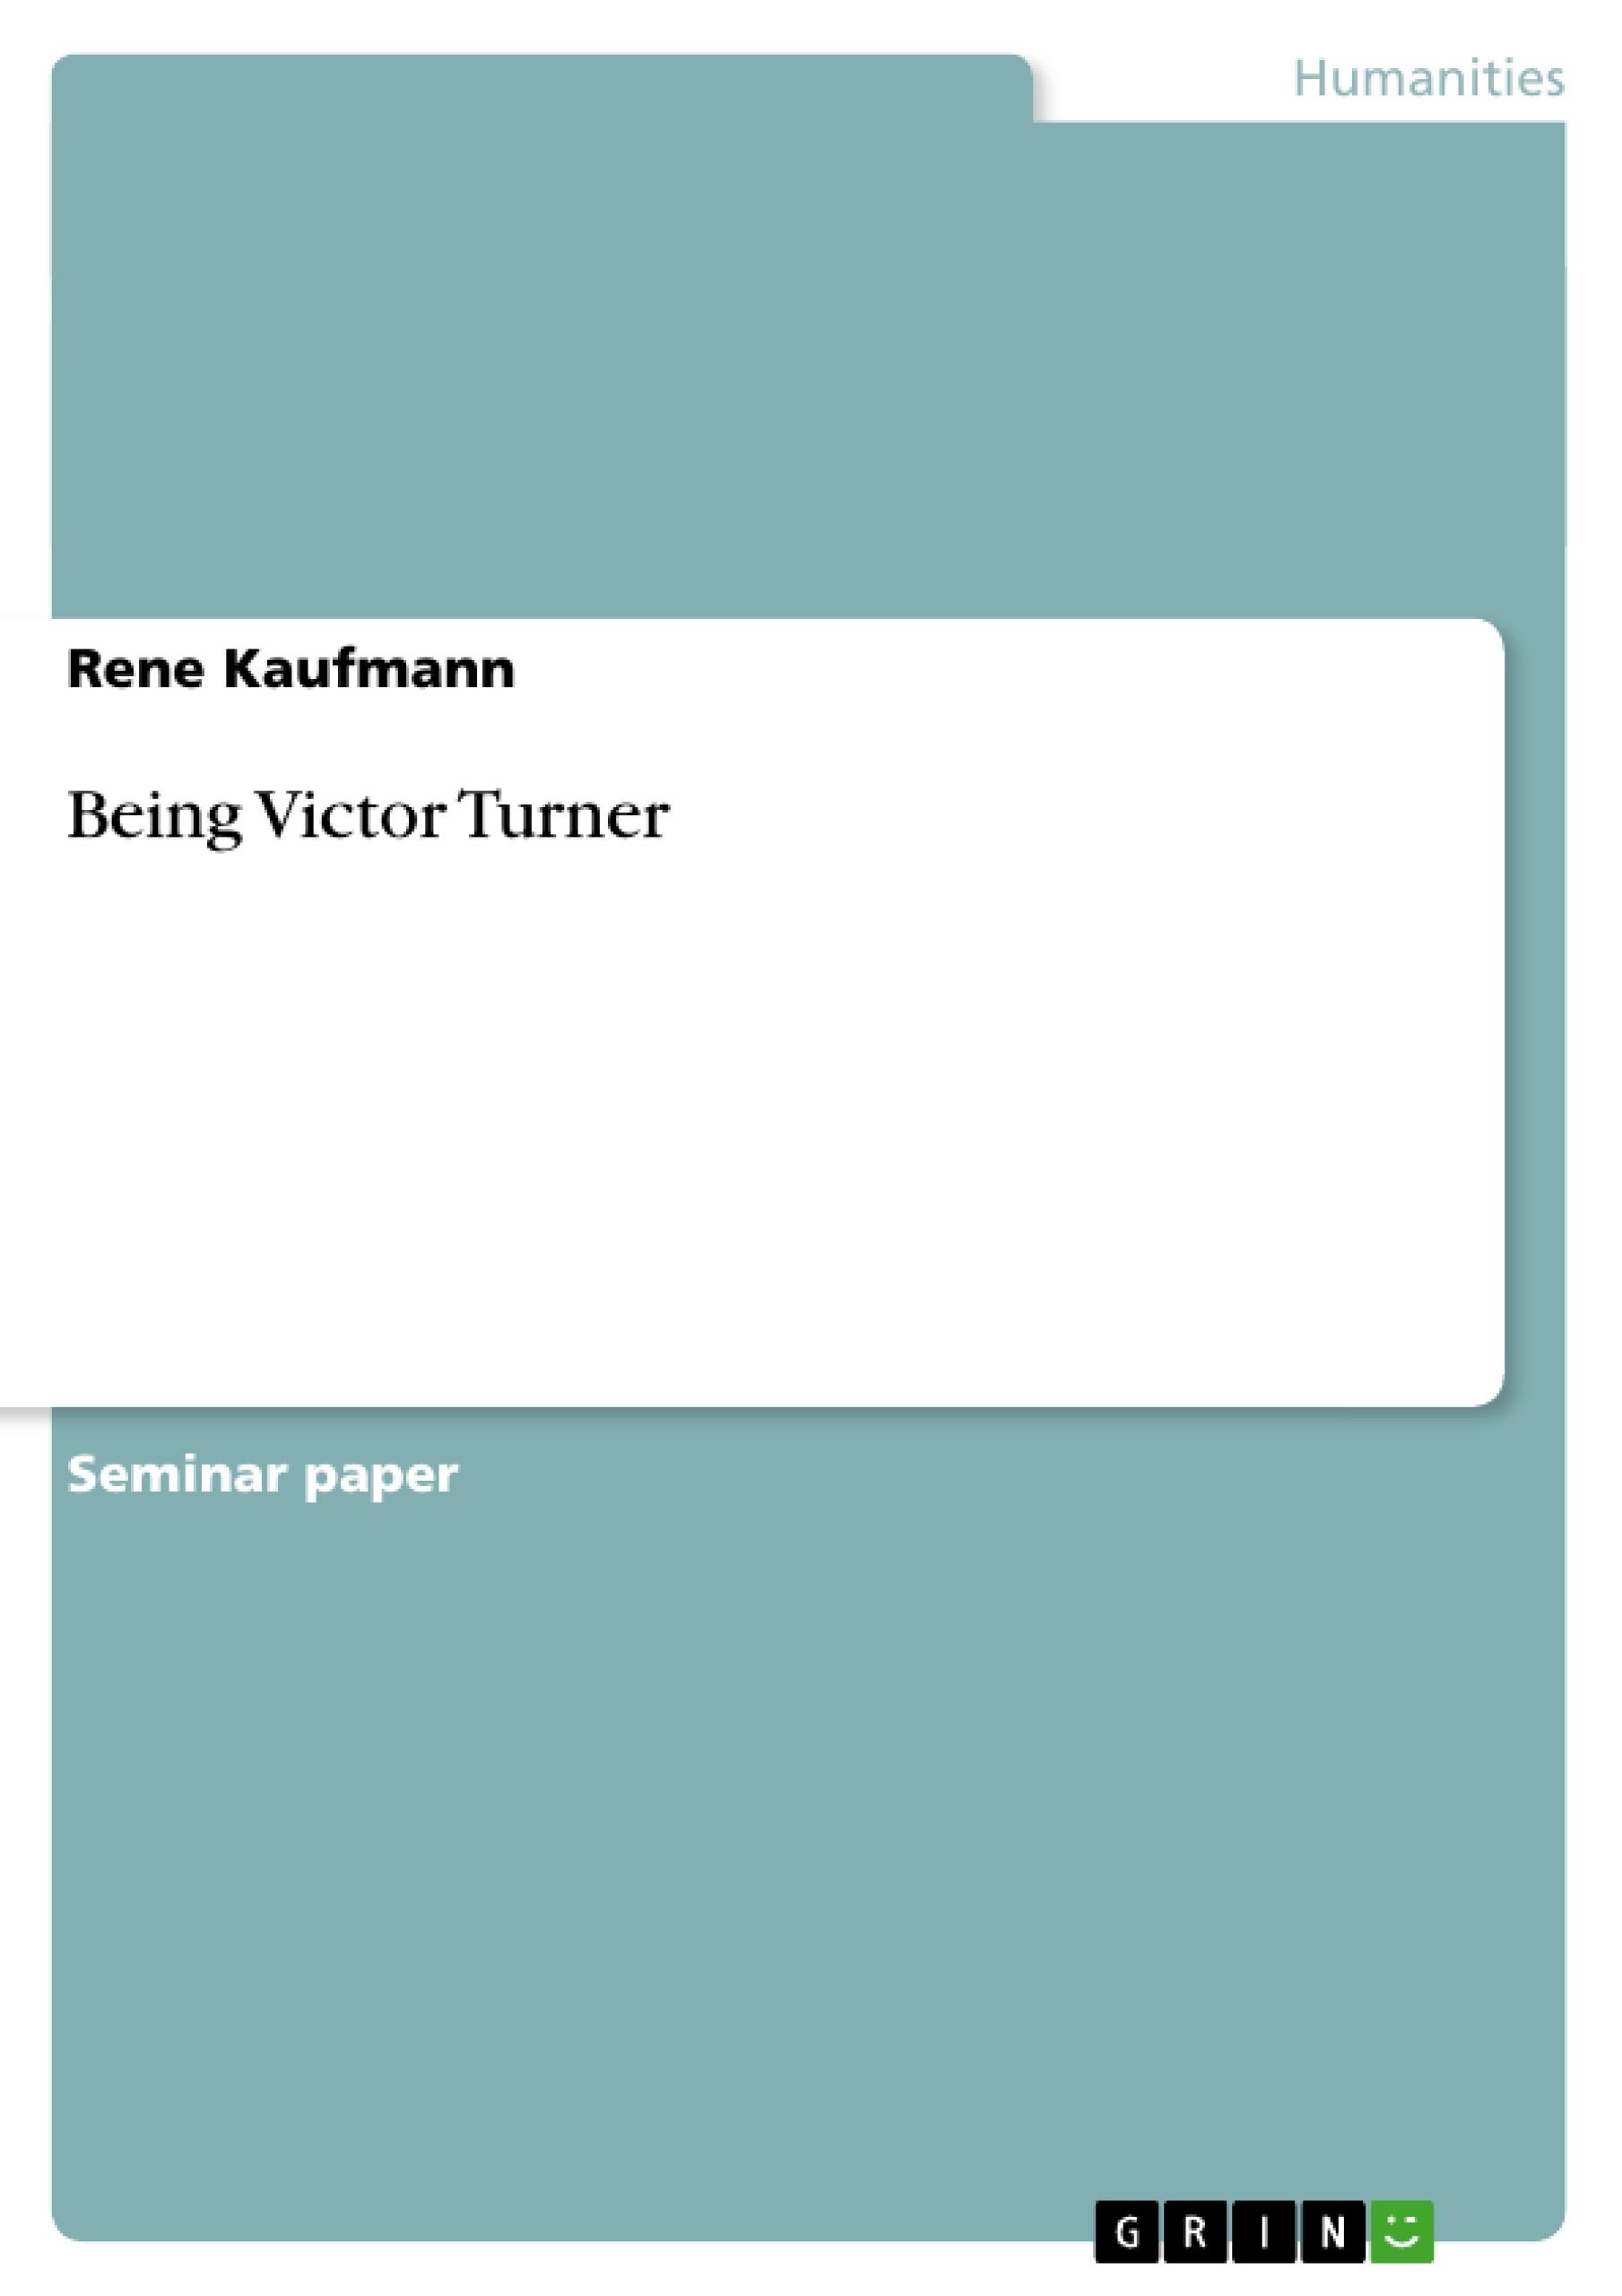 Title: Being Victor Turner